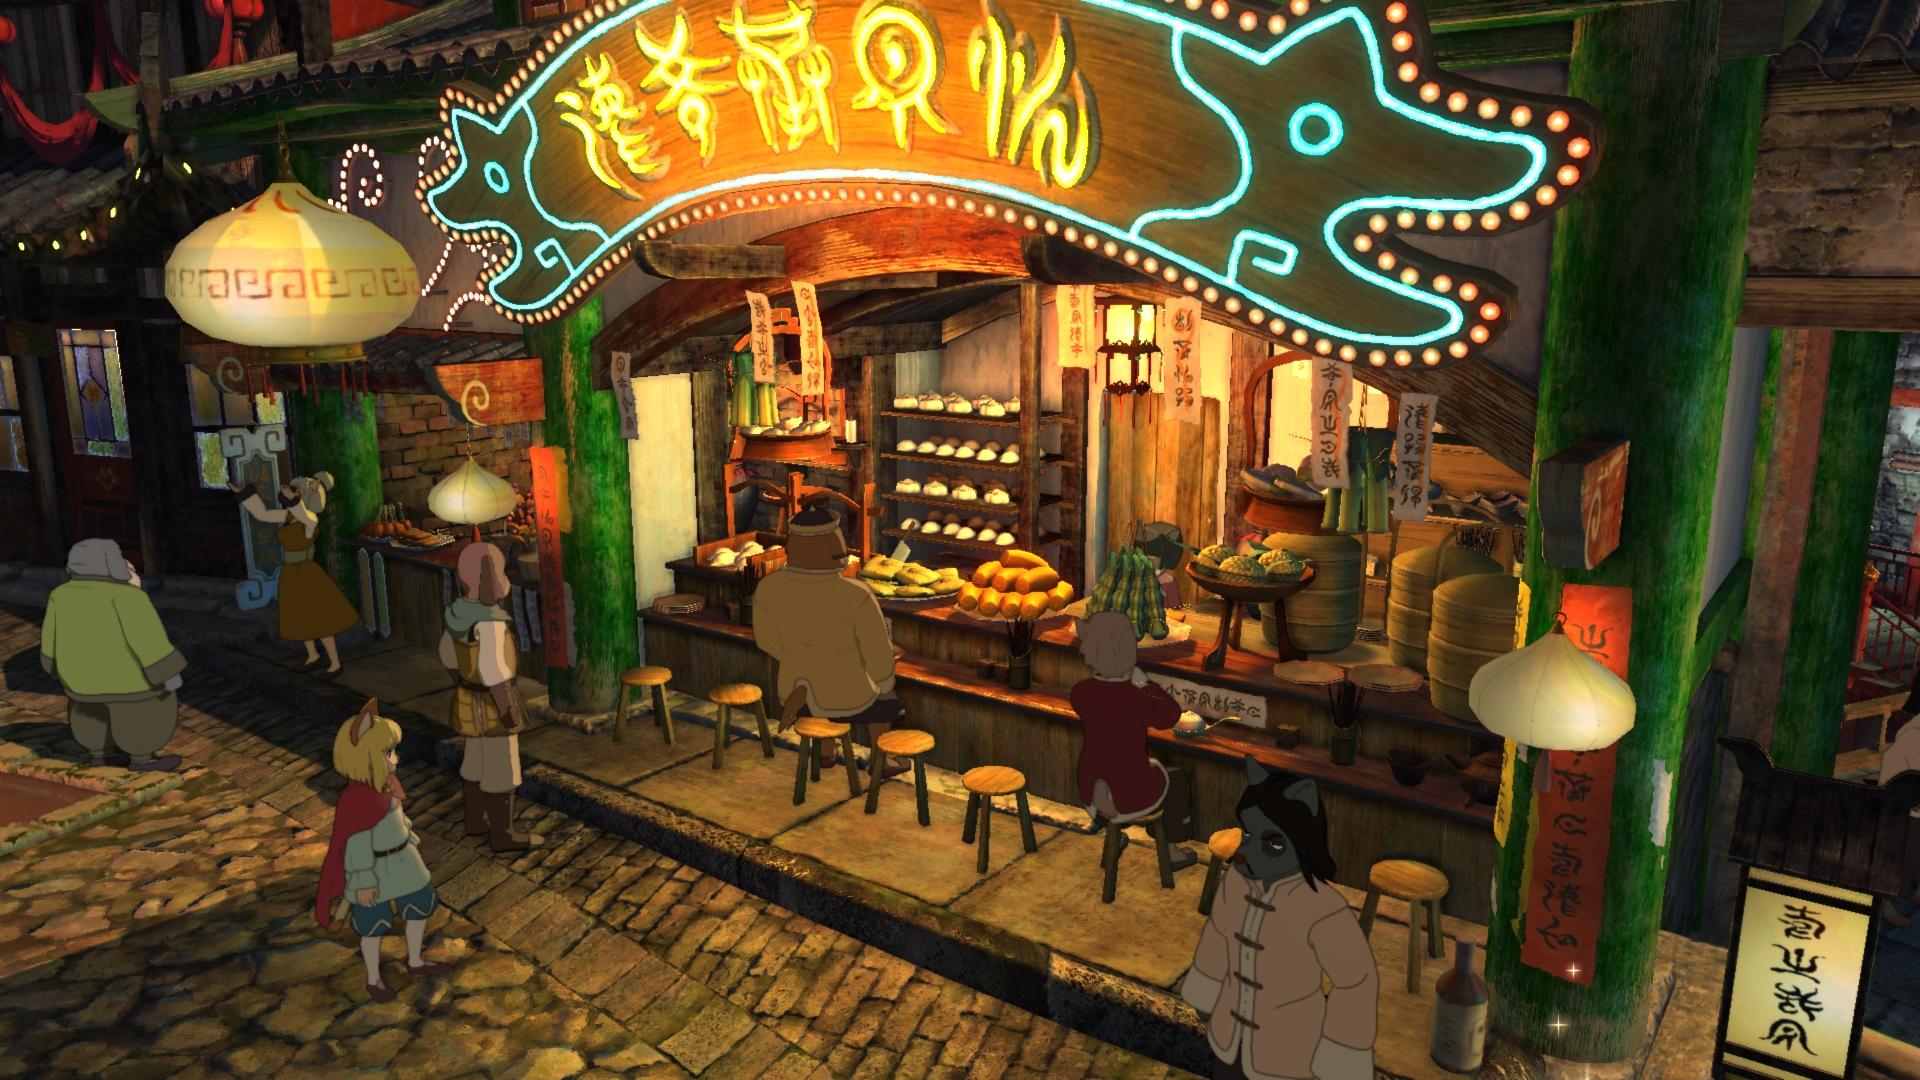 Ni no Kuni II: Revenant Kingdom v traileru a na screenshotech pro letošní Gamescom 148578